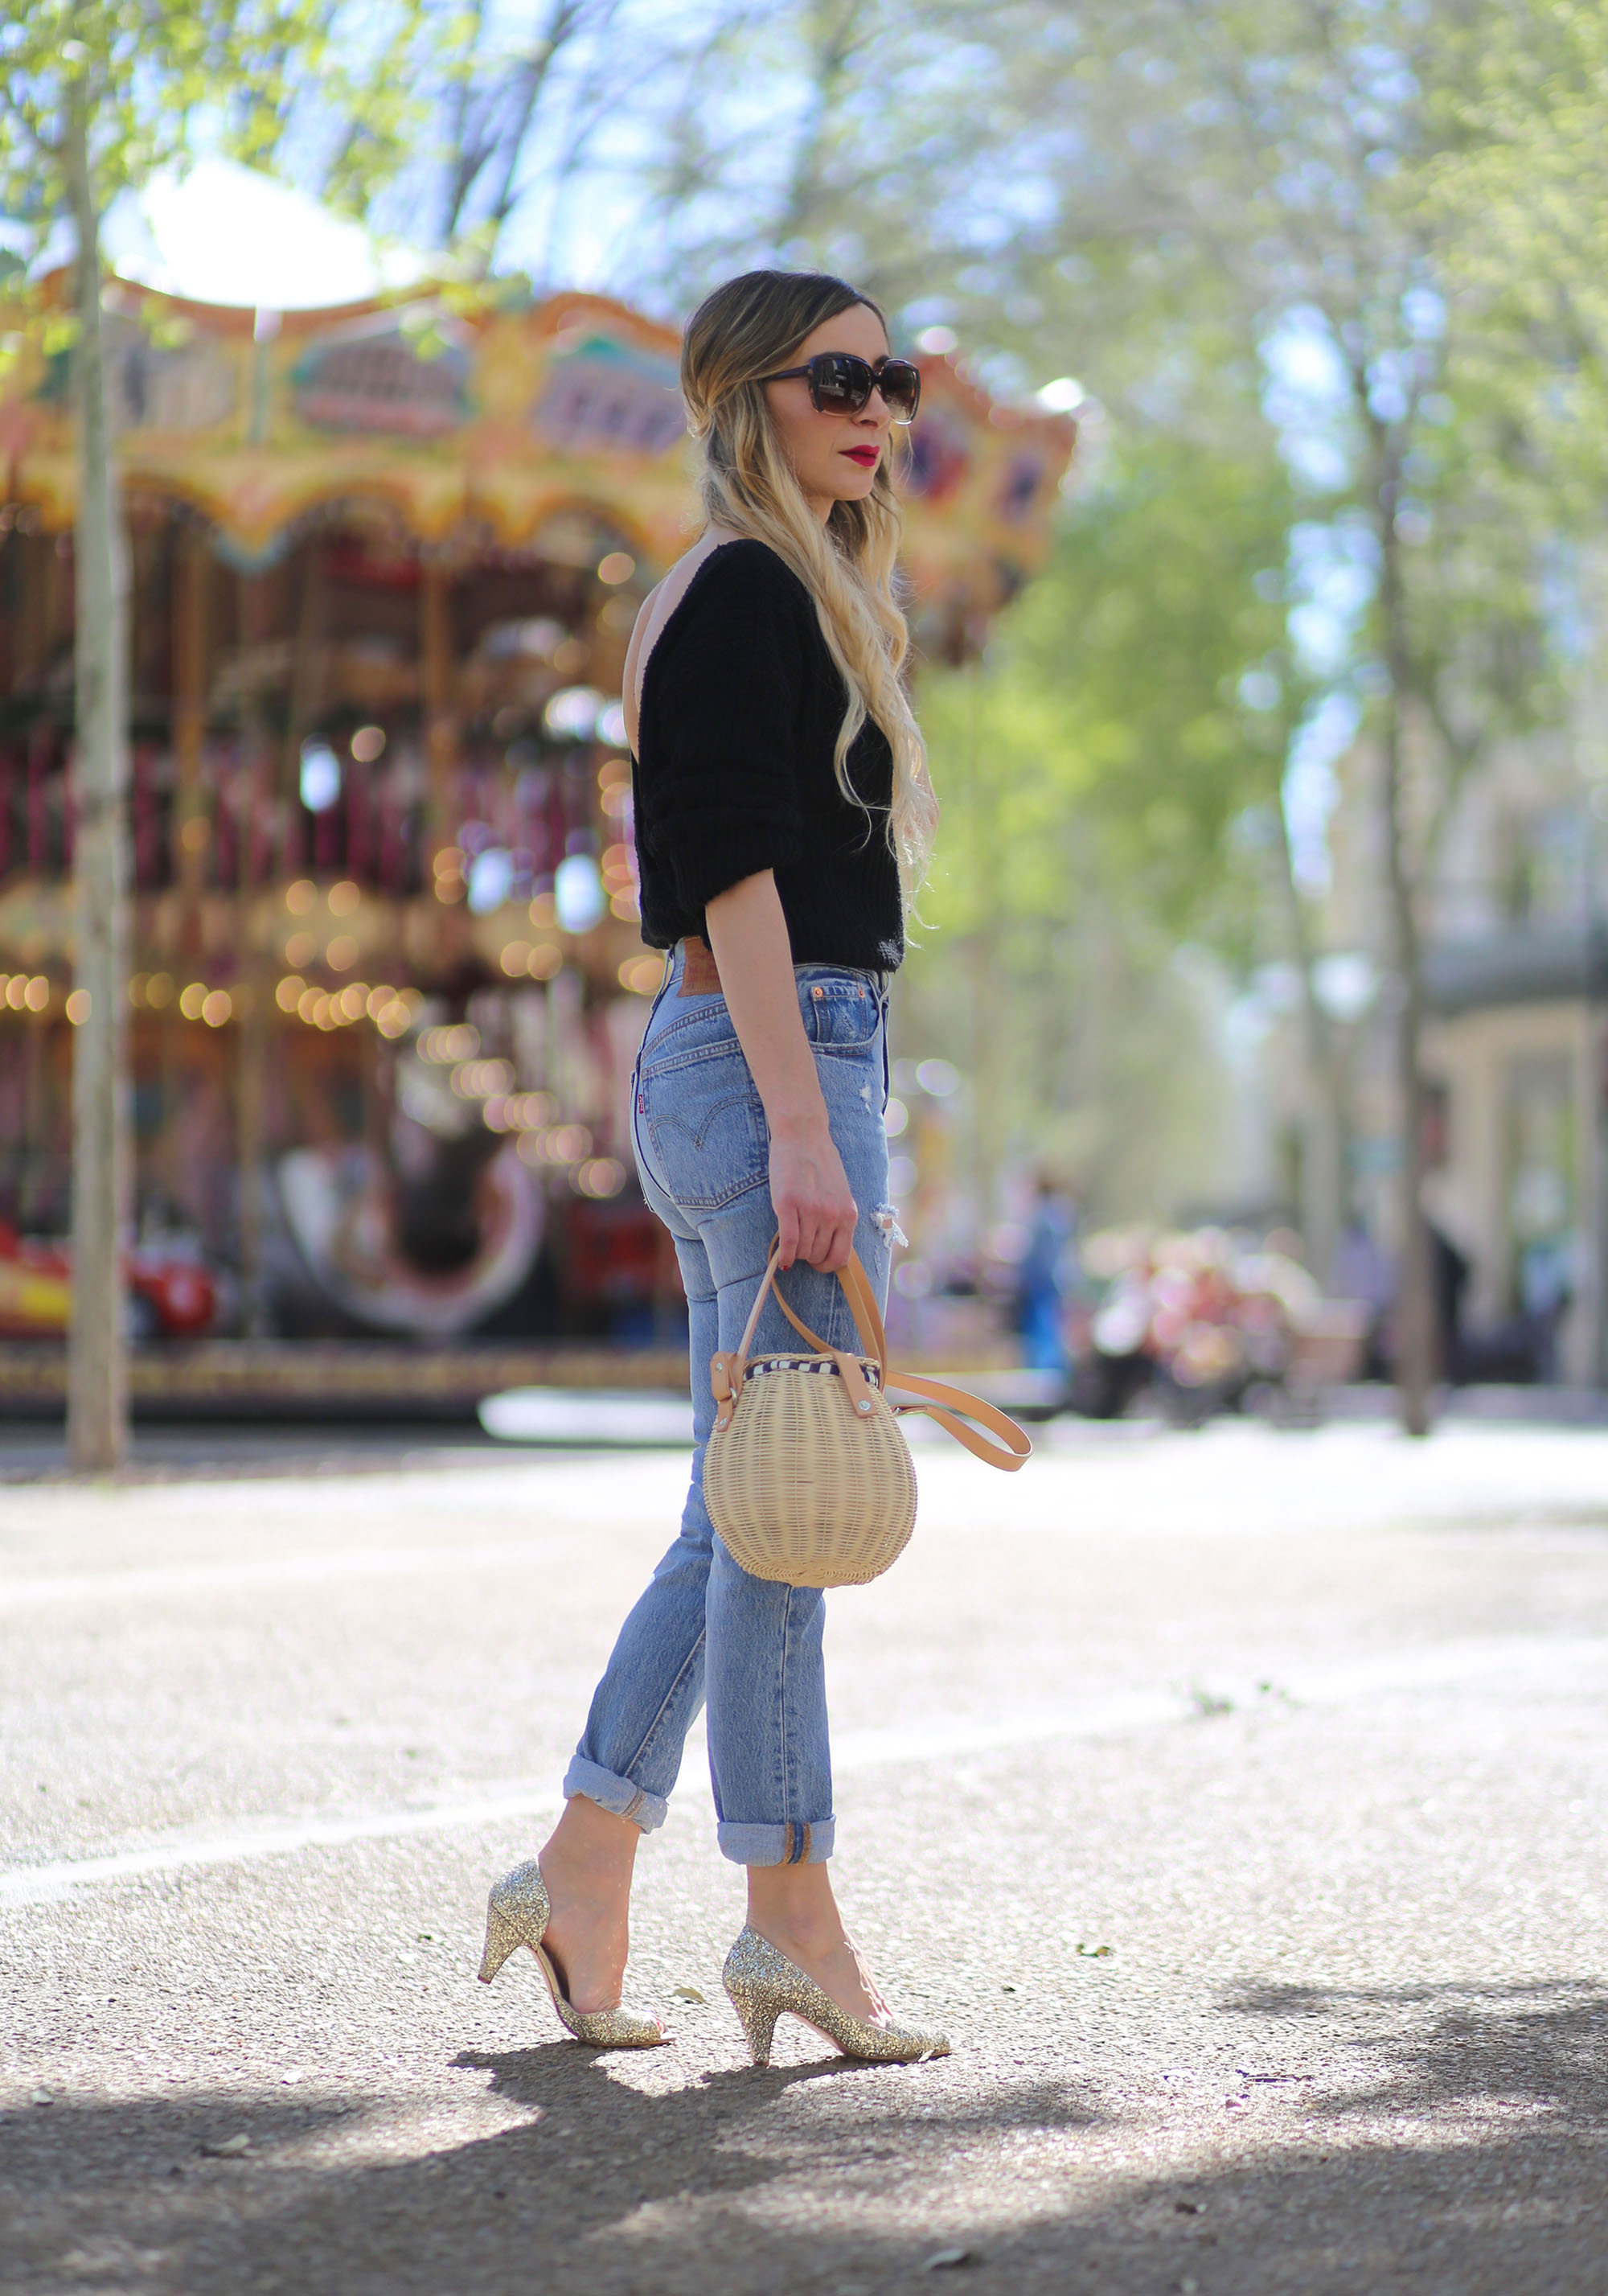 Lily Levi's Mode Skinny 501 Chelmey Blog 4awAg6Oq